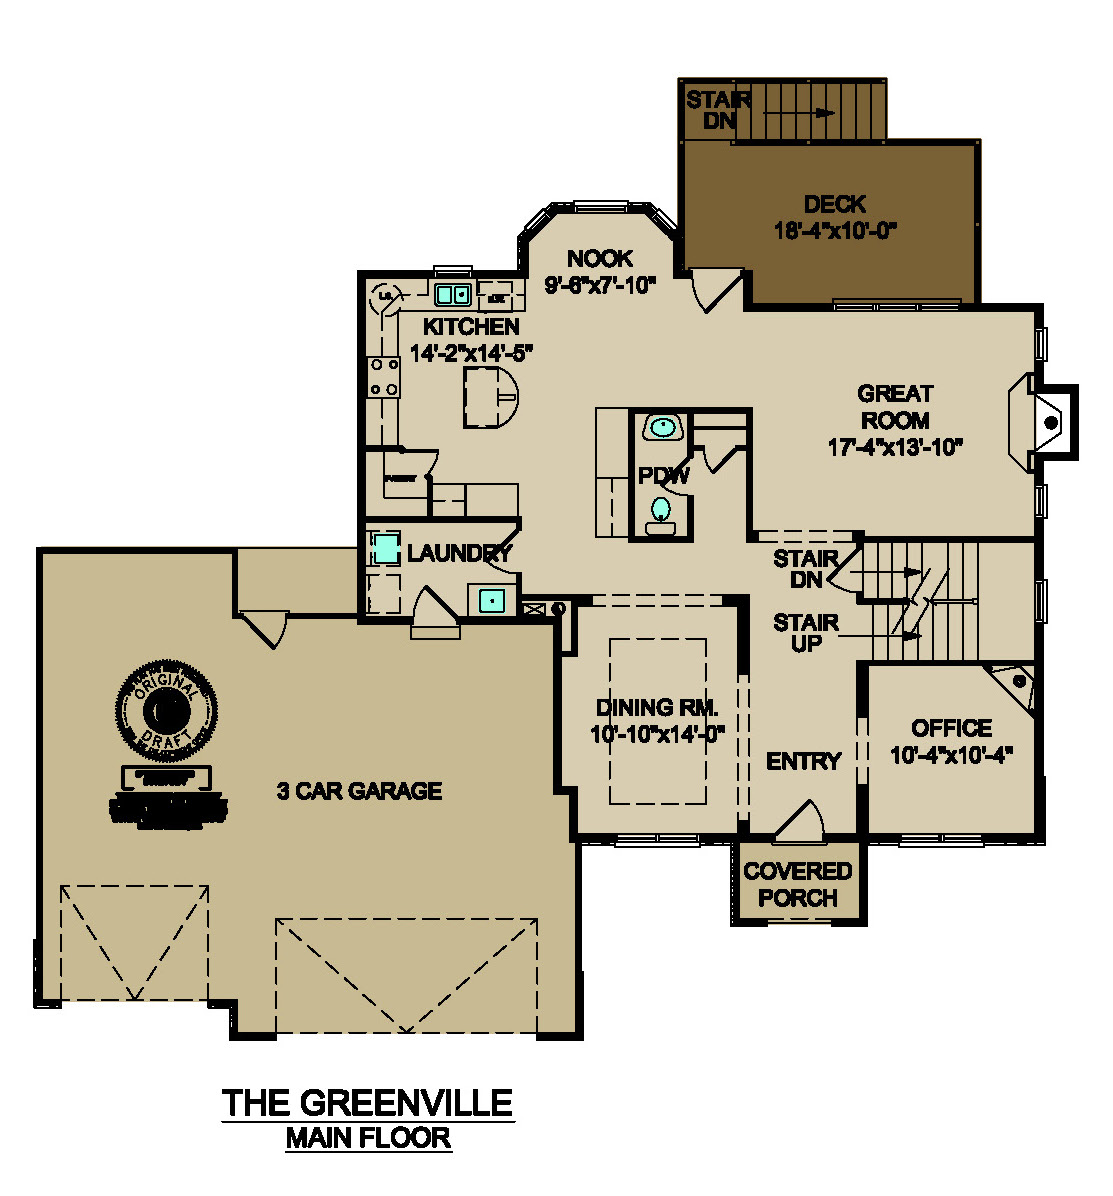 greenvillefloorplan2012 Main Floor.jpeg